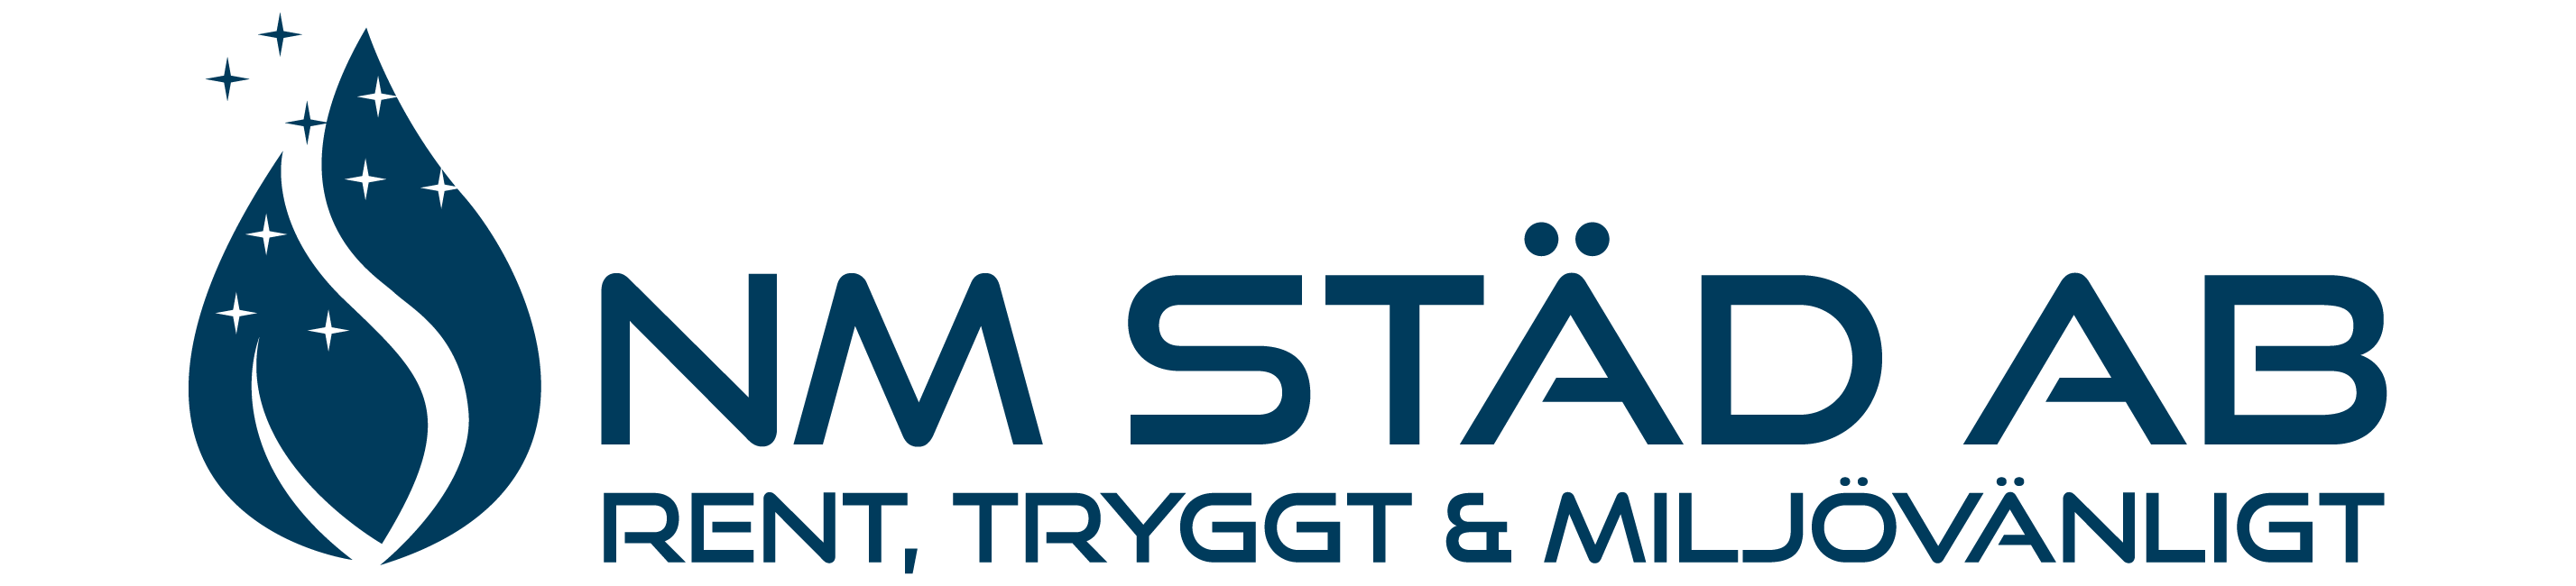 NM Städ AB | Bästa Städfirma Stockholm